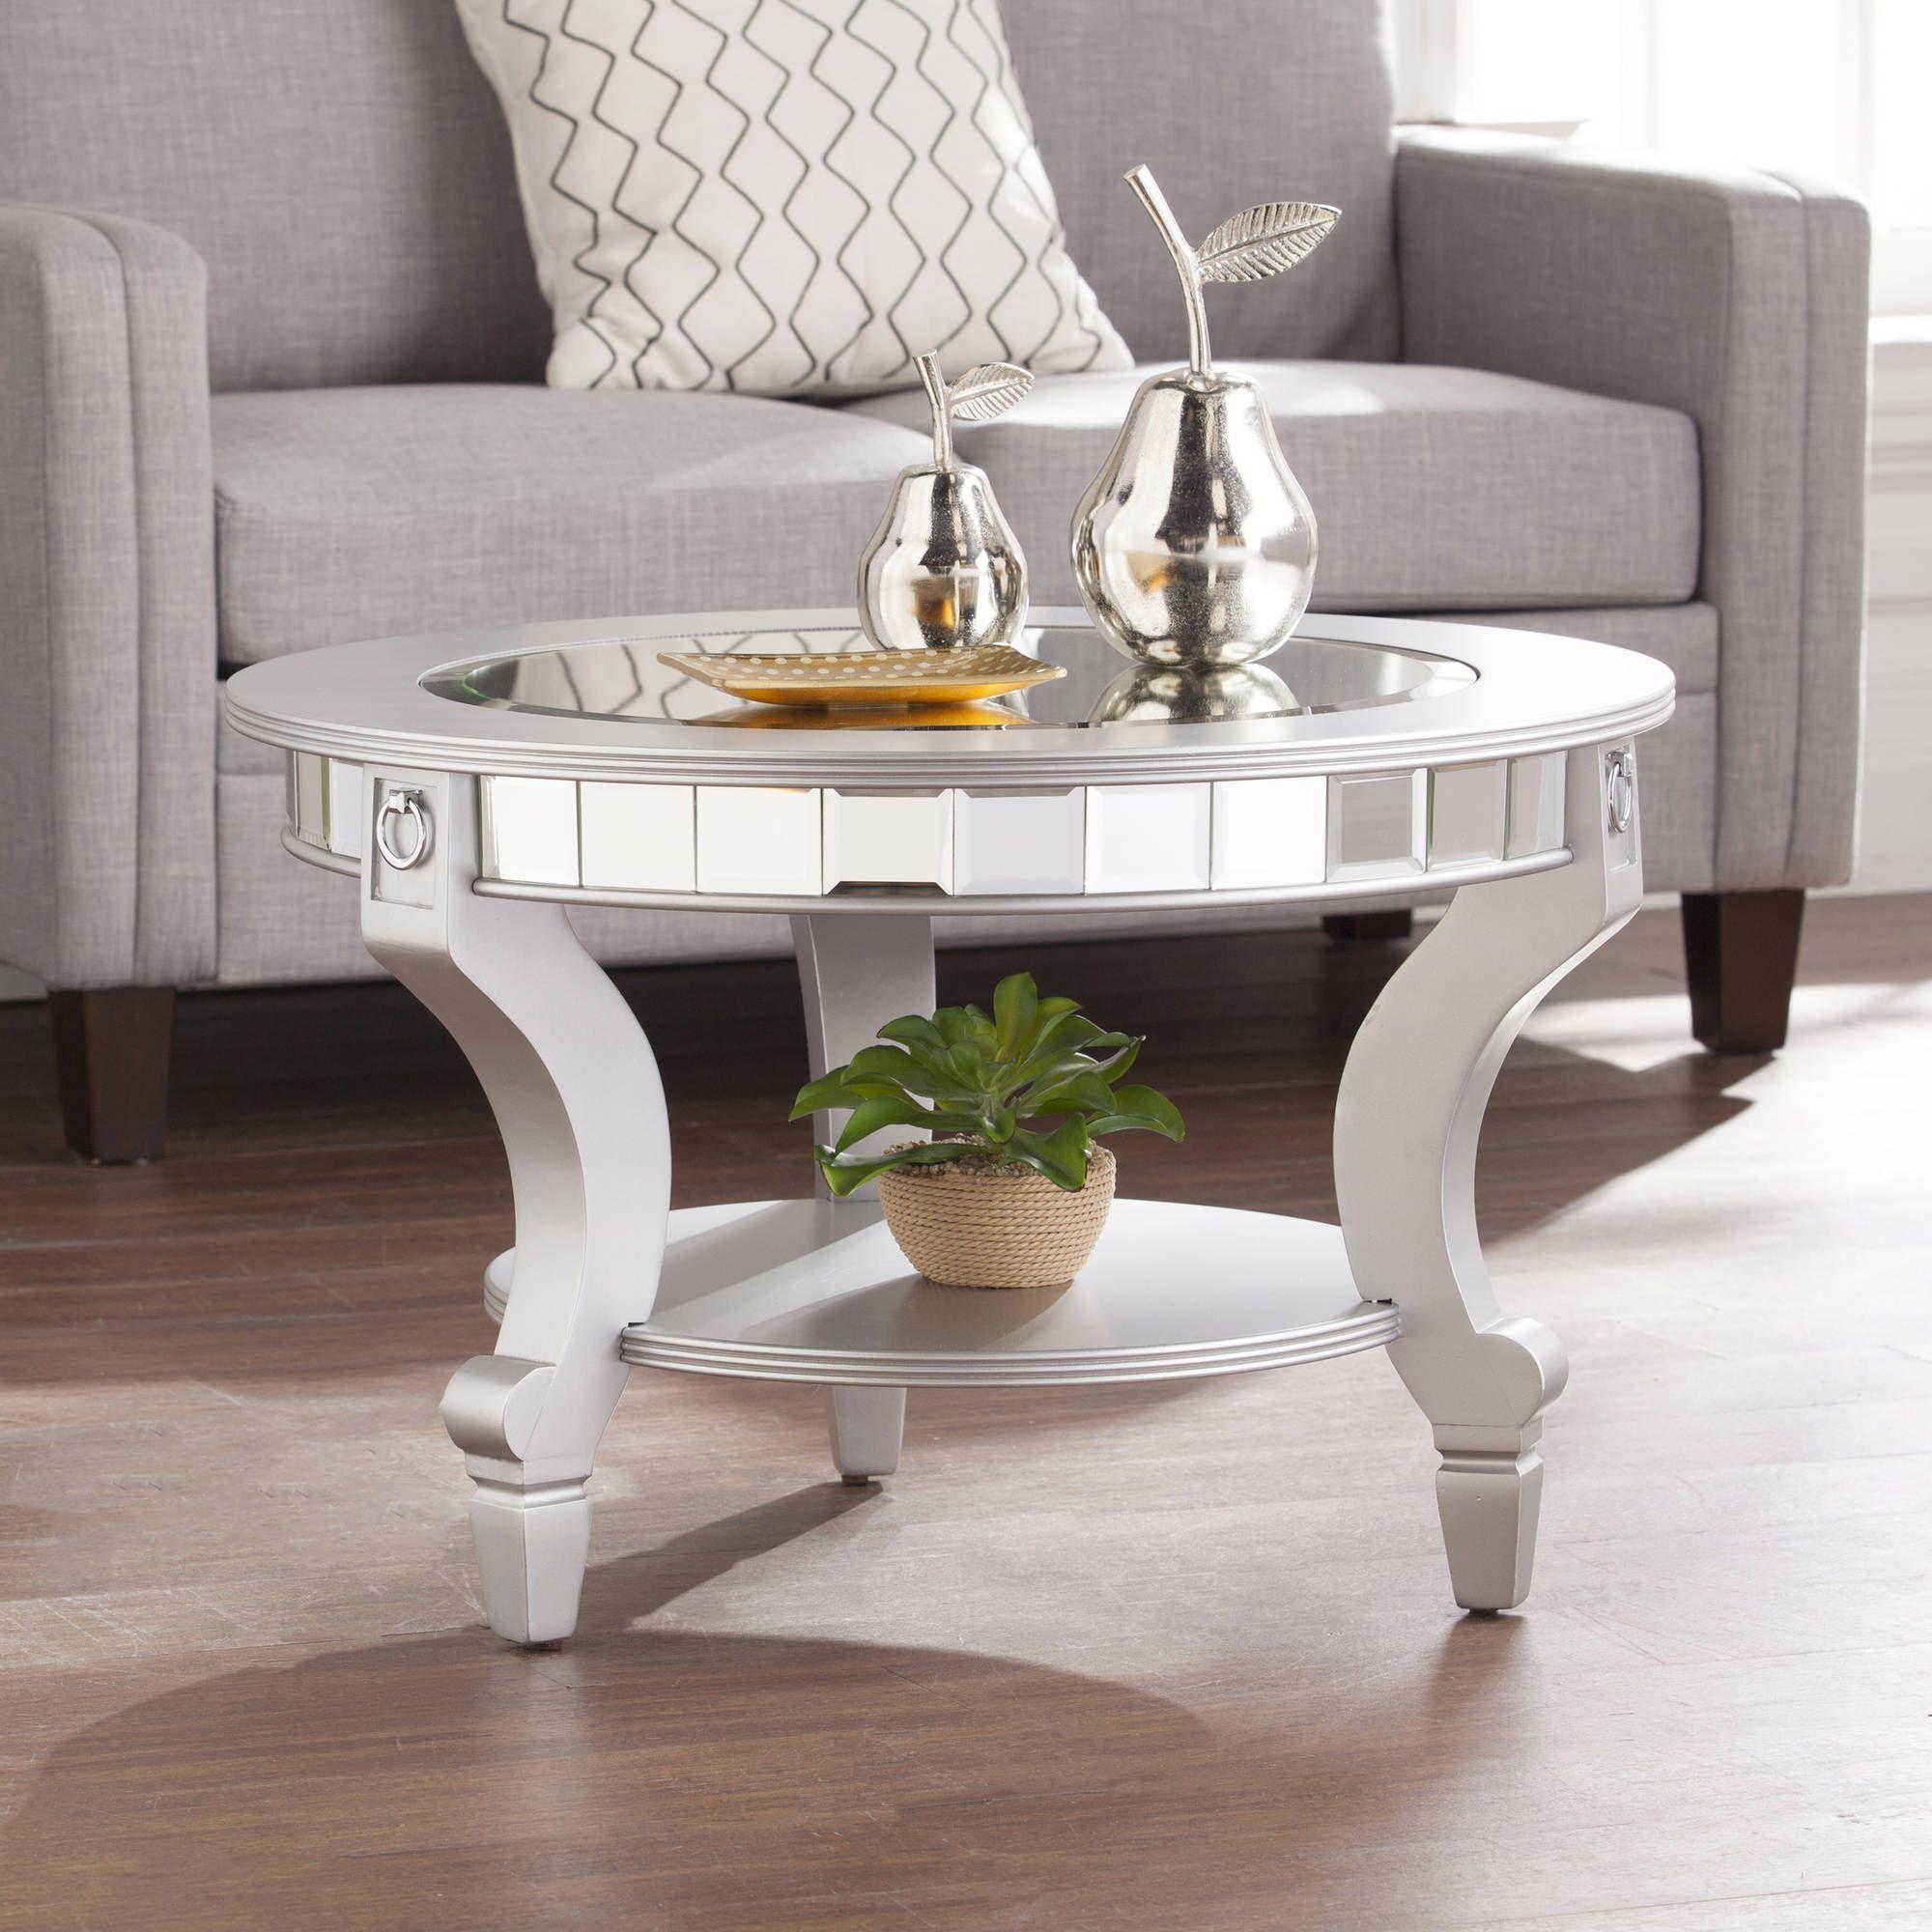 Ladislas Glam Mirrored Round Coffee Table Matte Silver By Ember Interiors Walmart Com Coffee Table Mirrored Coffee Tables Round Coffee Table [ 2000 x 2000 Pixel ]